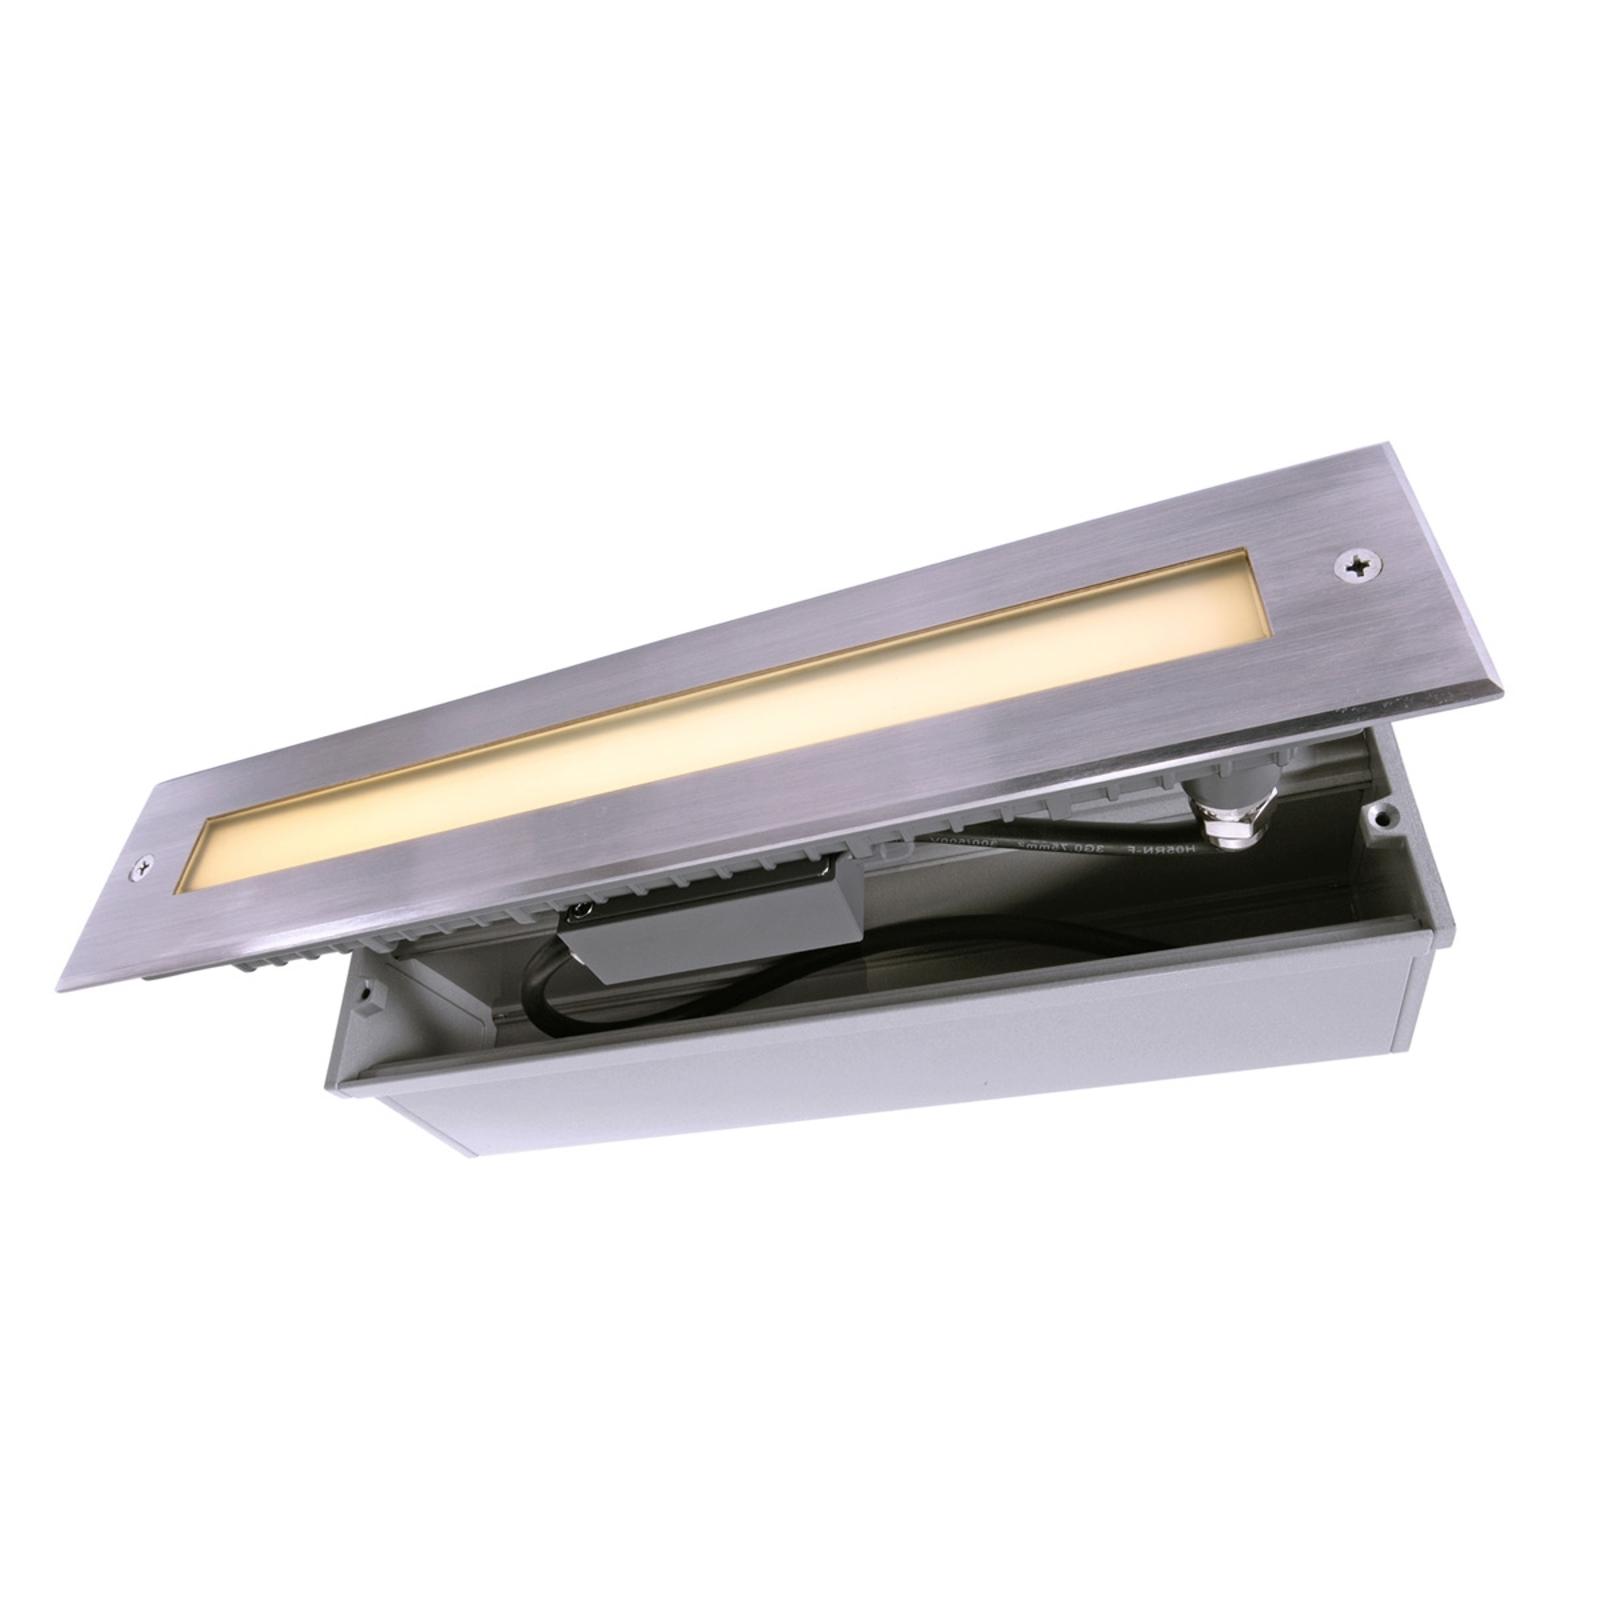 LED-golvinbyggnadslampa Line, längd 32,8 cm